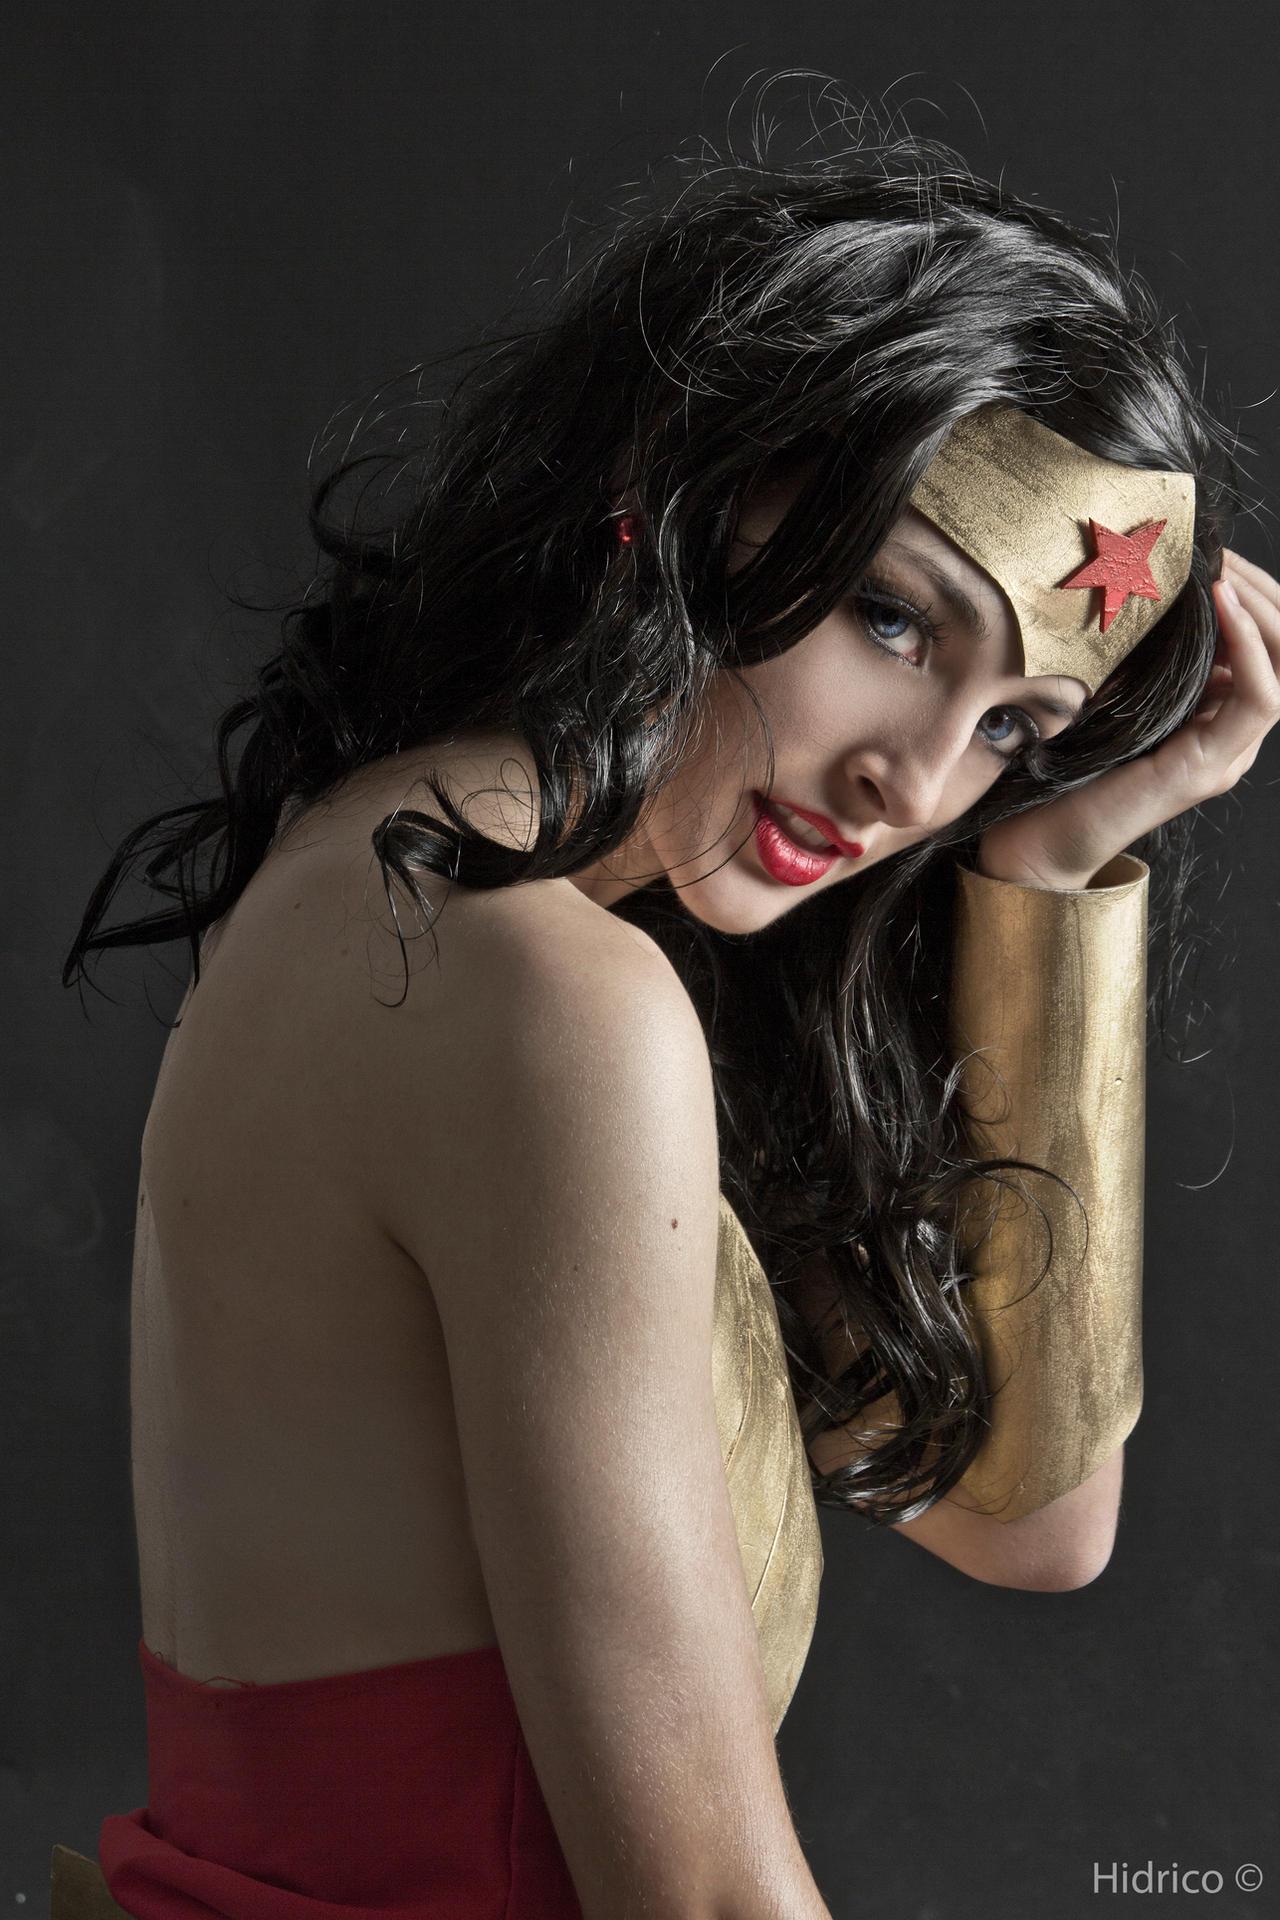 Wonder Woman - Portrait 2 by Hidrico